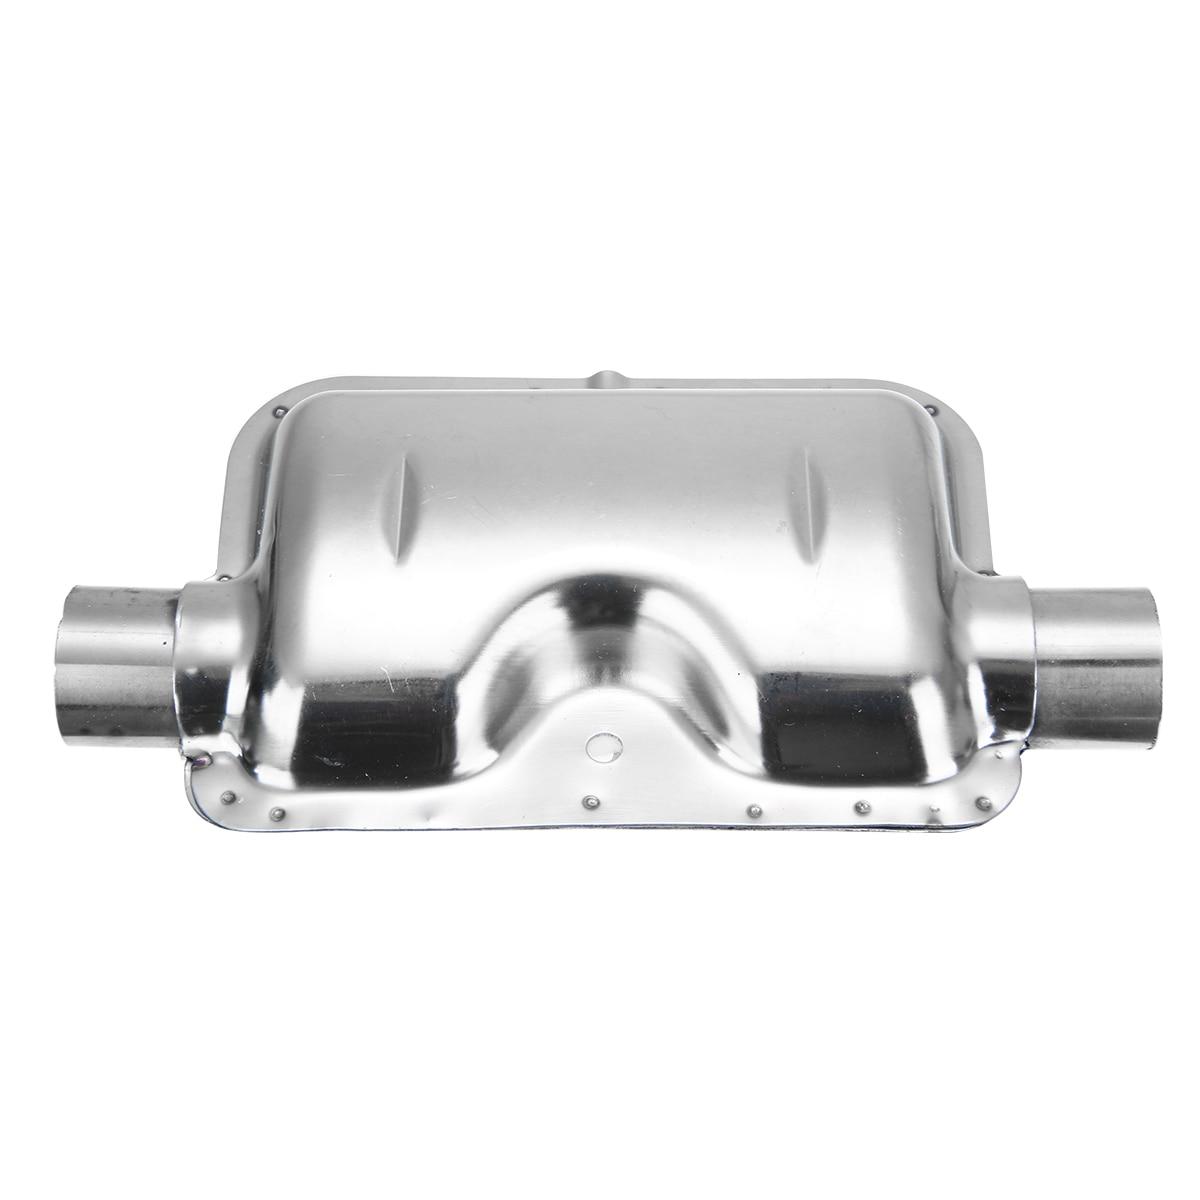 Espar Eberspacher  Webasto Heater 24mm Exhaust Elbow Stainless Steel